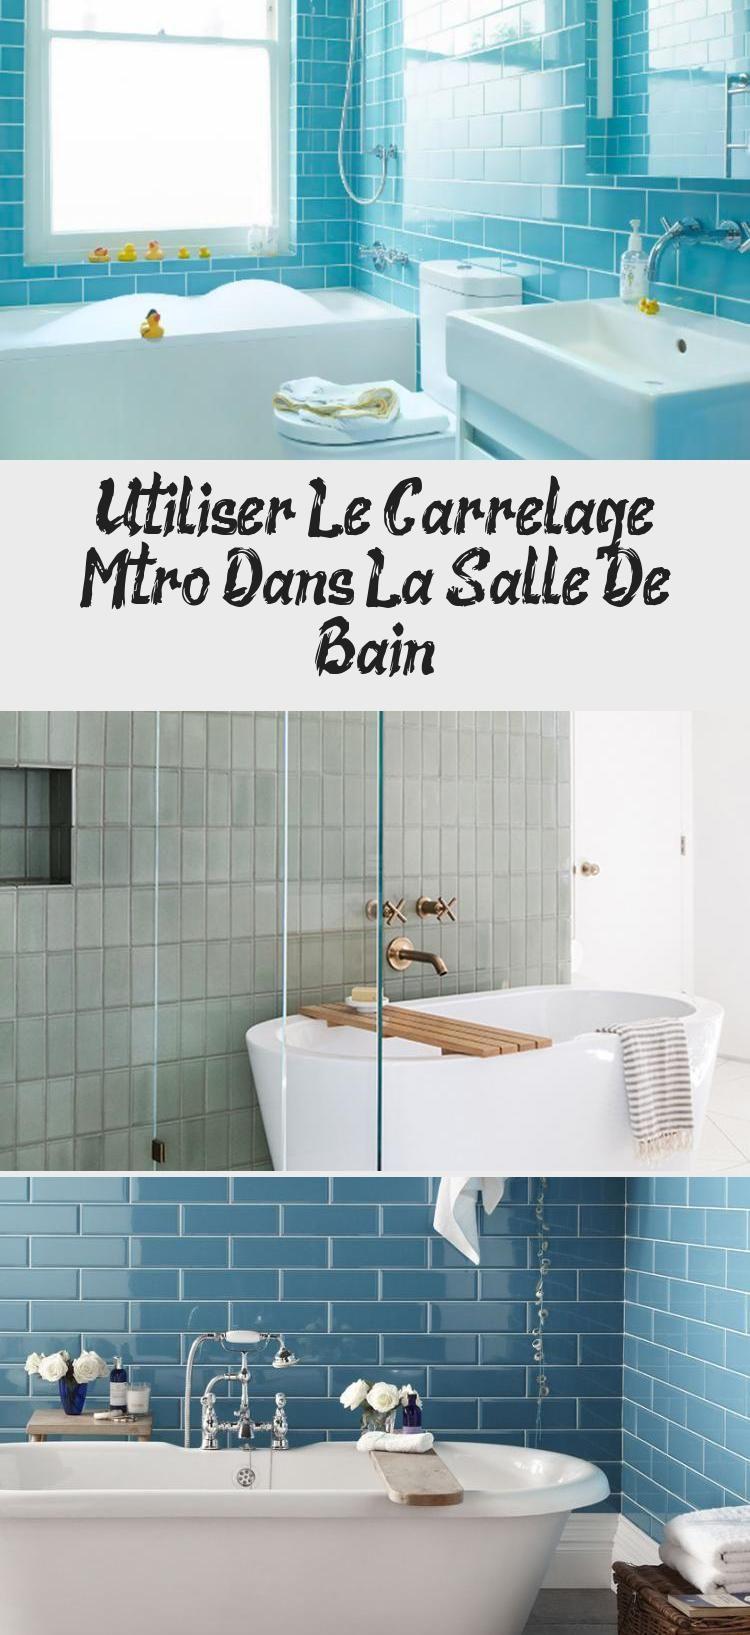 Utiliser Le Carrelage Metro Dans La Salle De Bain In 2020 Home